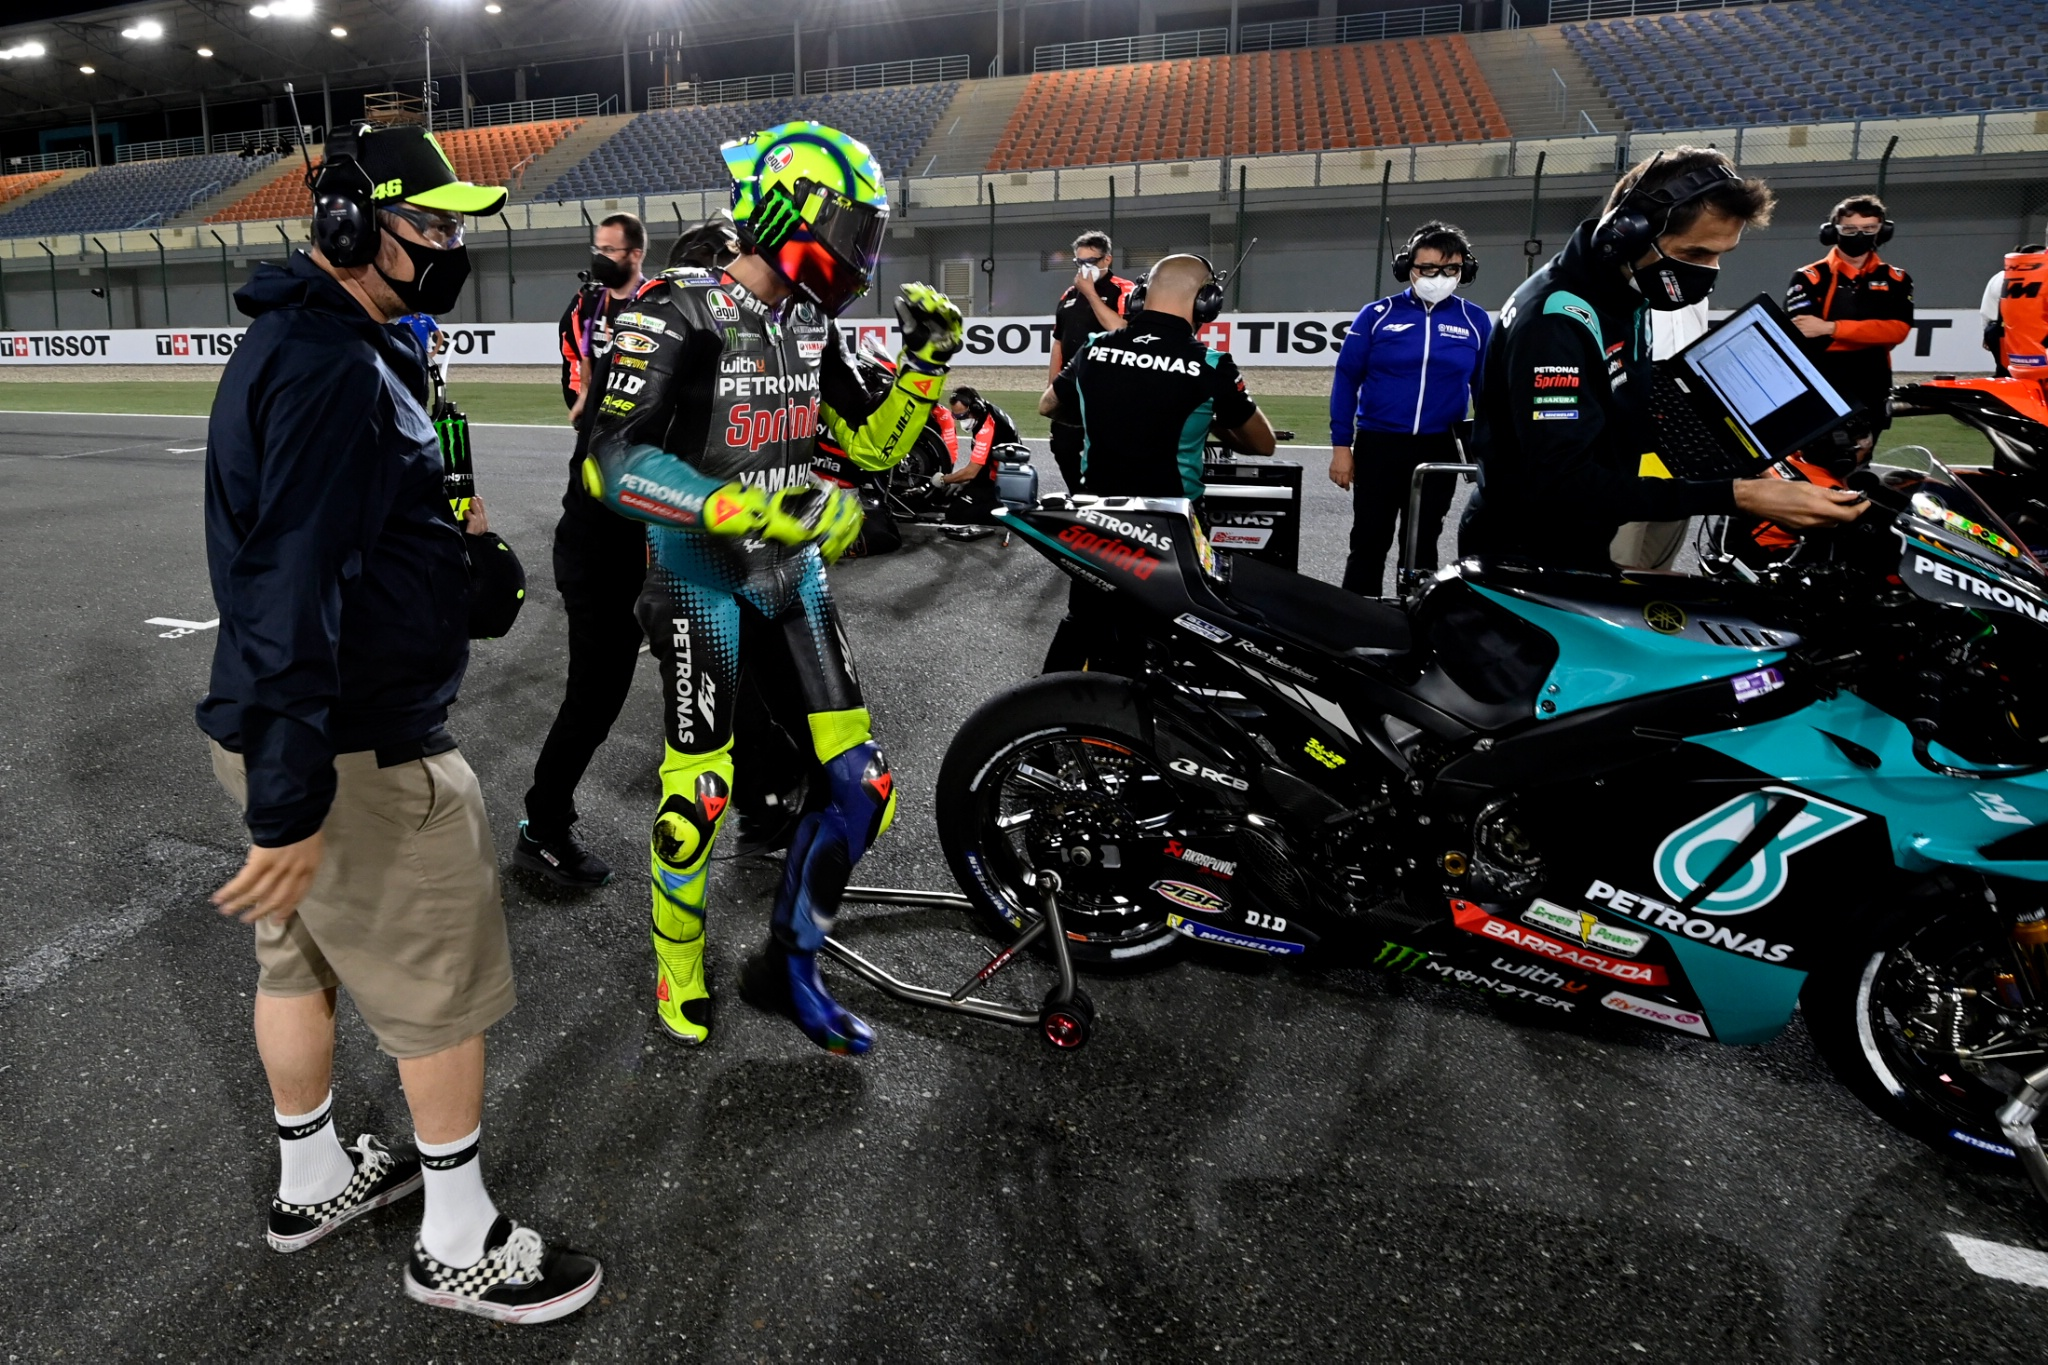 Valentino Rossi, MotoGP, Doha MotoGP race, 4 April 2021